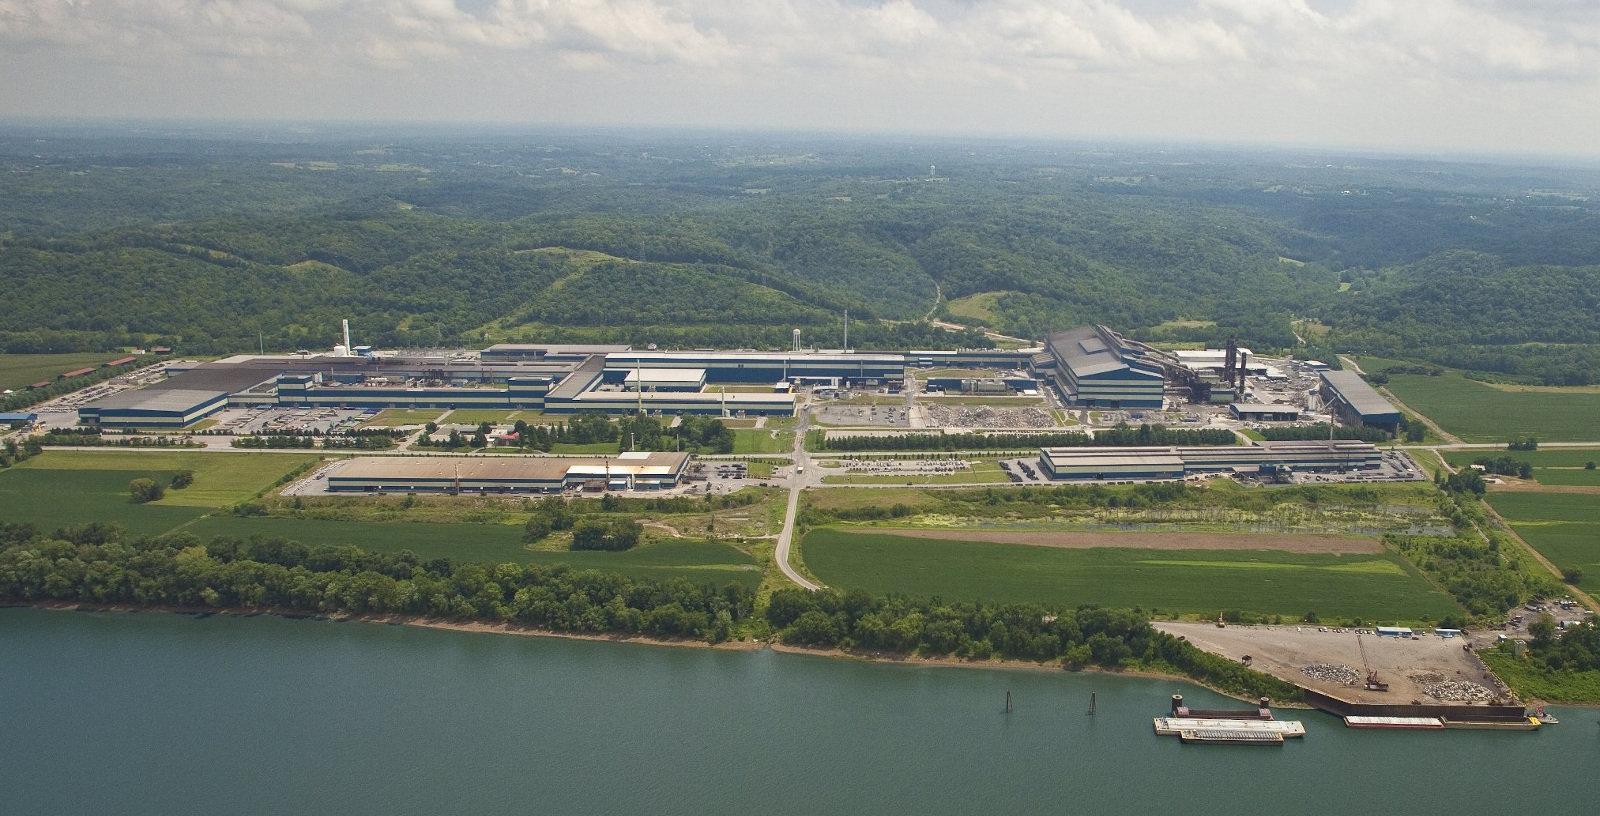 NAS_Stainless_steel_plant_Kentucky_Acerinox_IDOM